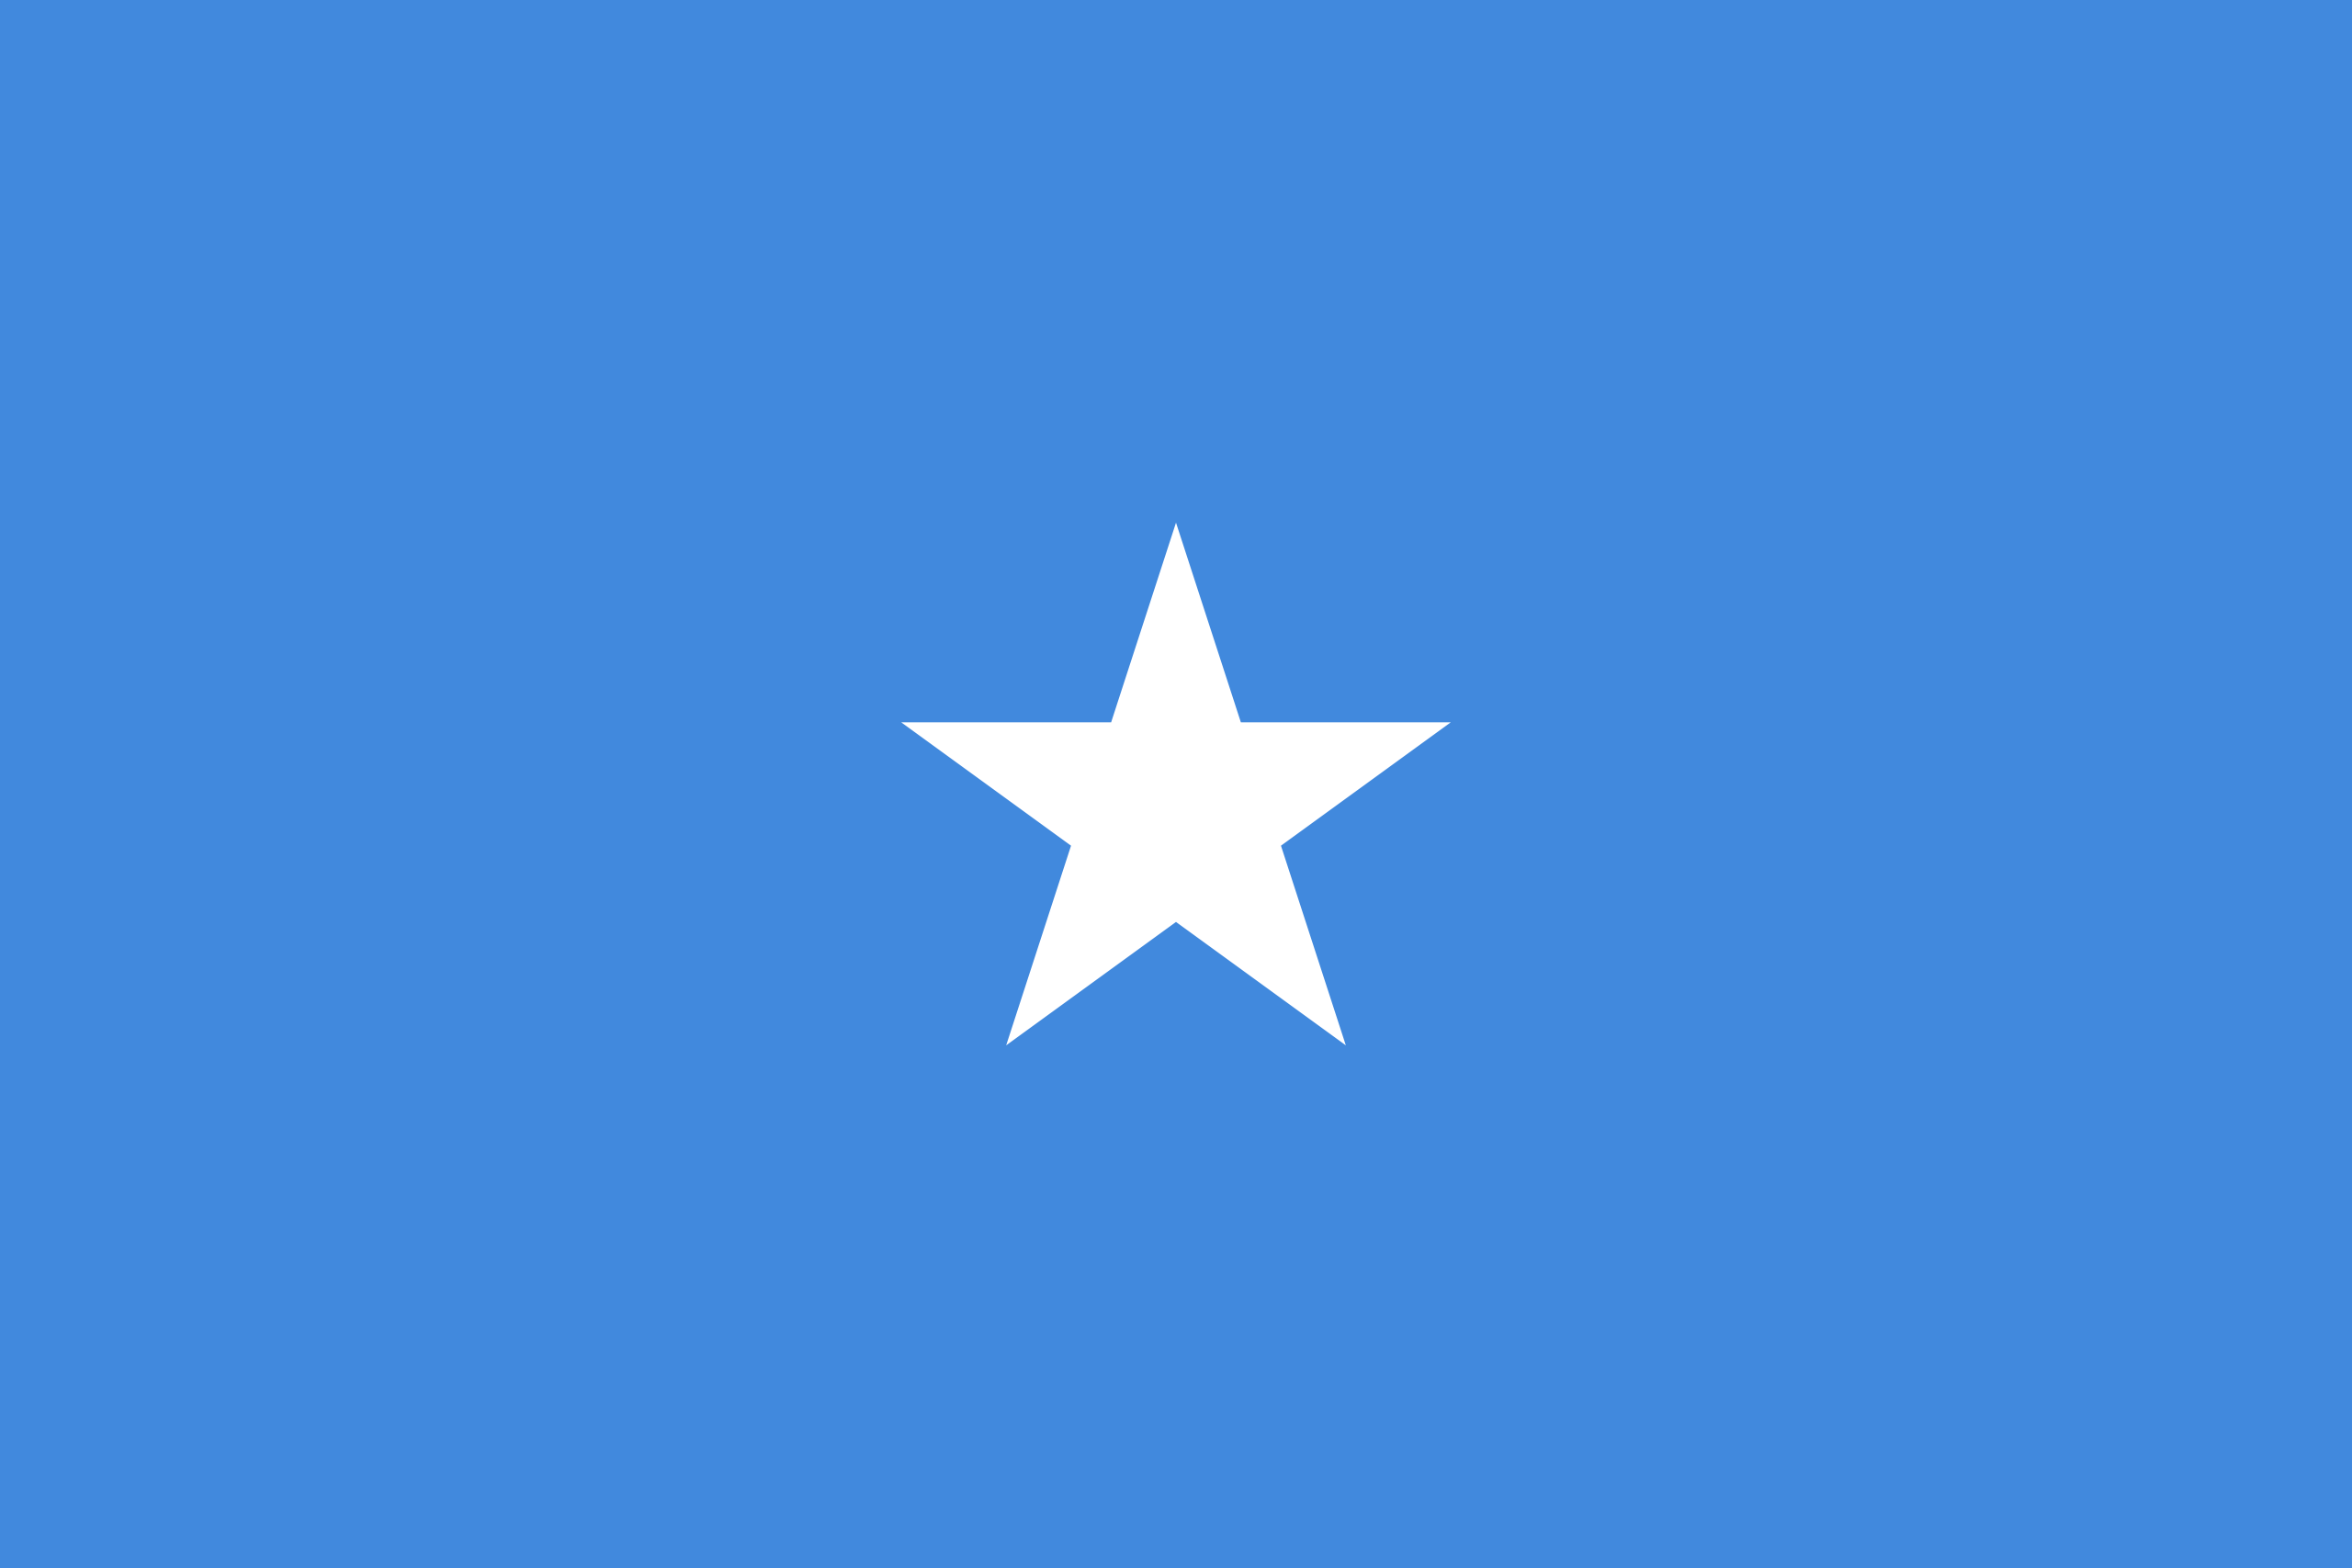 somalia, país, emblema, insignia, символ - Обои HD - Профессор falken.com